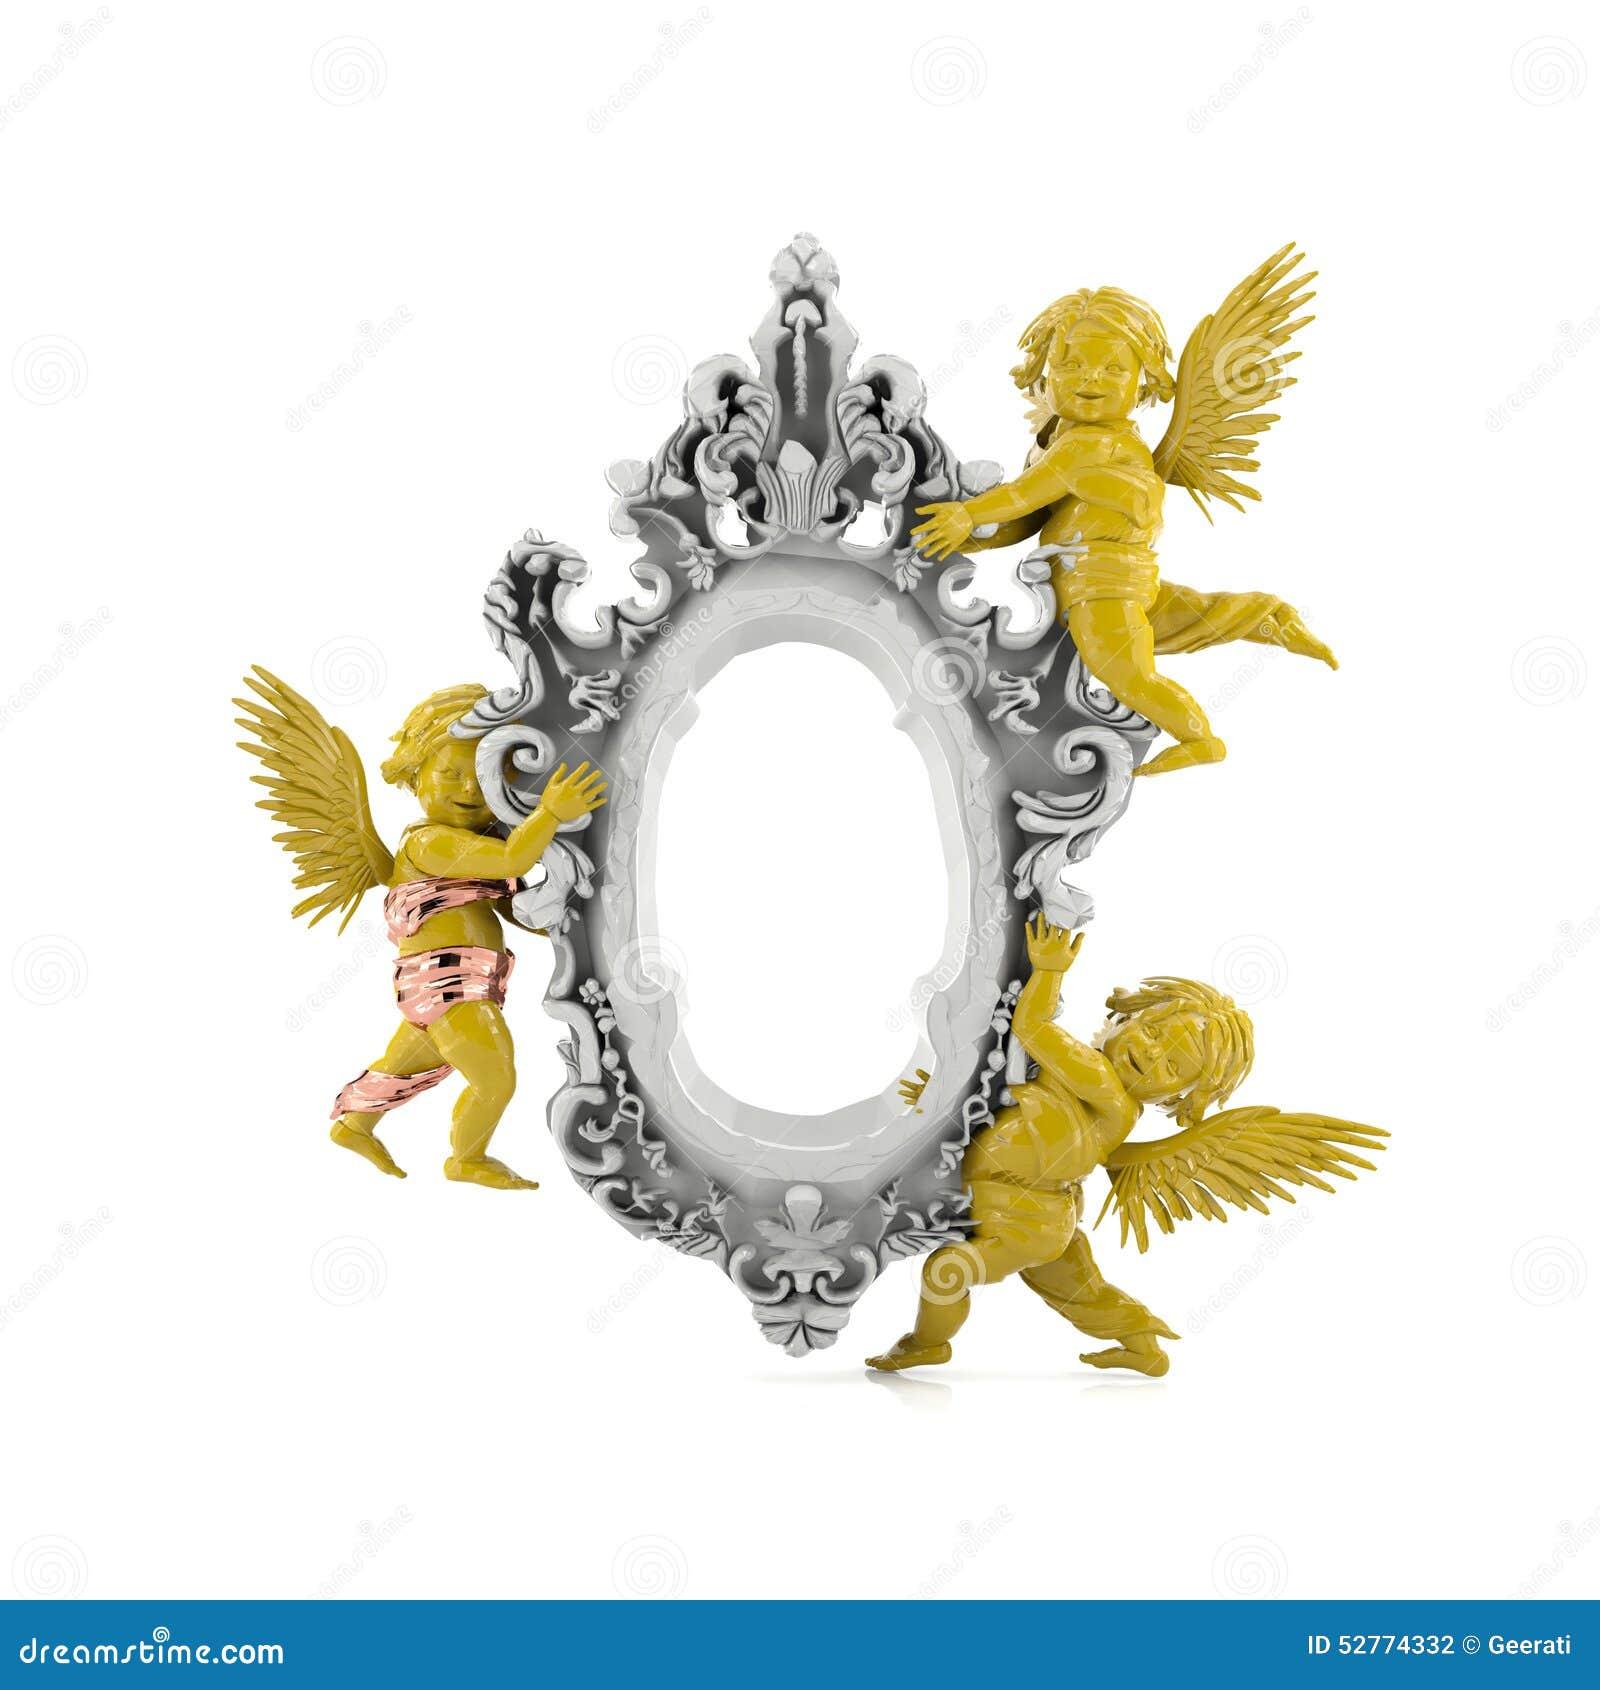 Classic angel frame stock photo. Image of empty, blank - 52774332